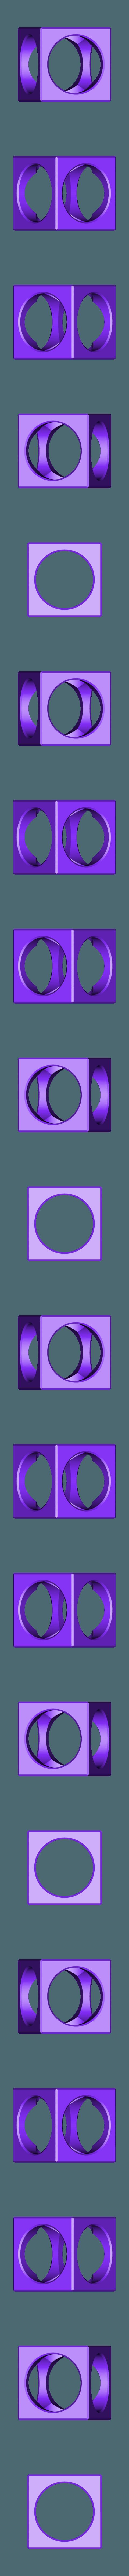 cage_puzzle.stl Download free STL file Big puzzle cube 1001 • 3D printer model, NOP21